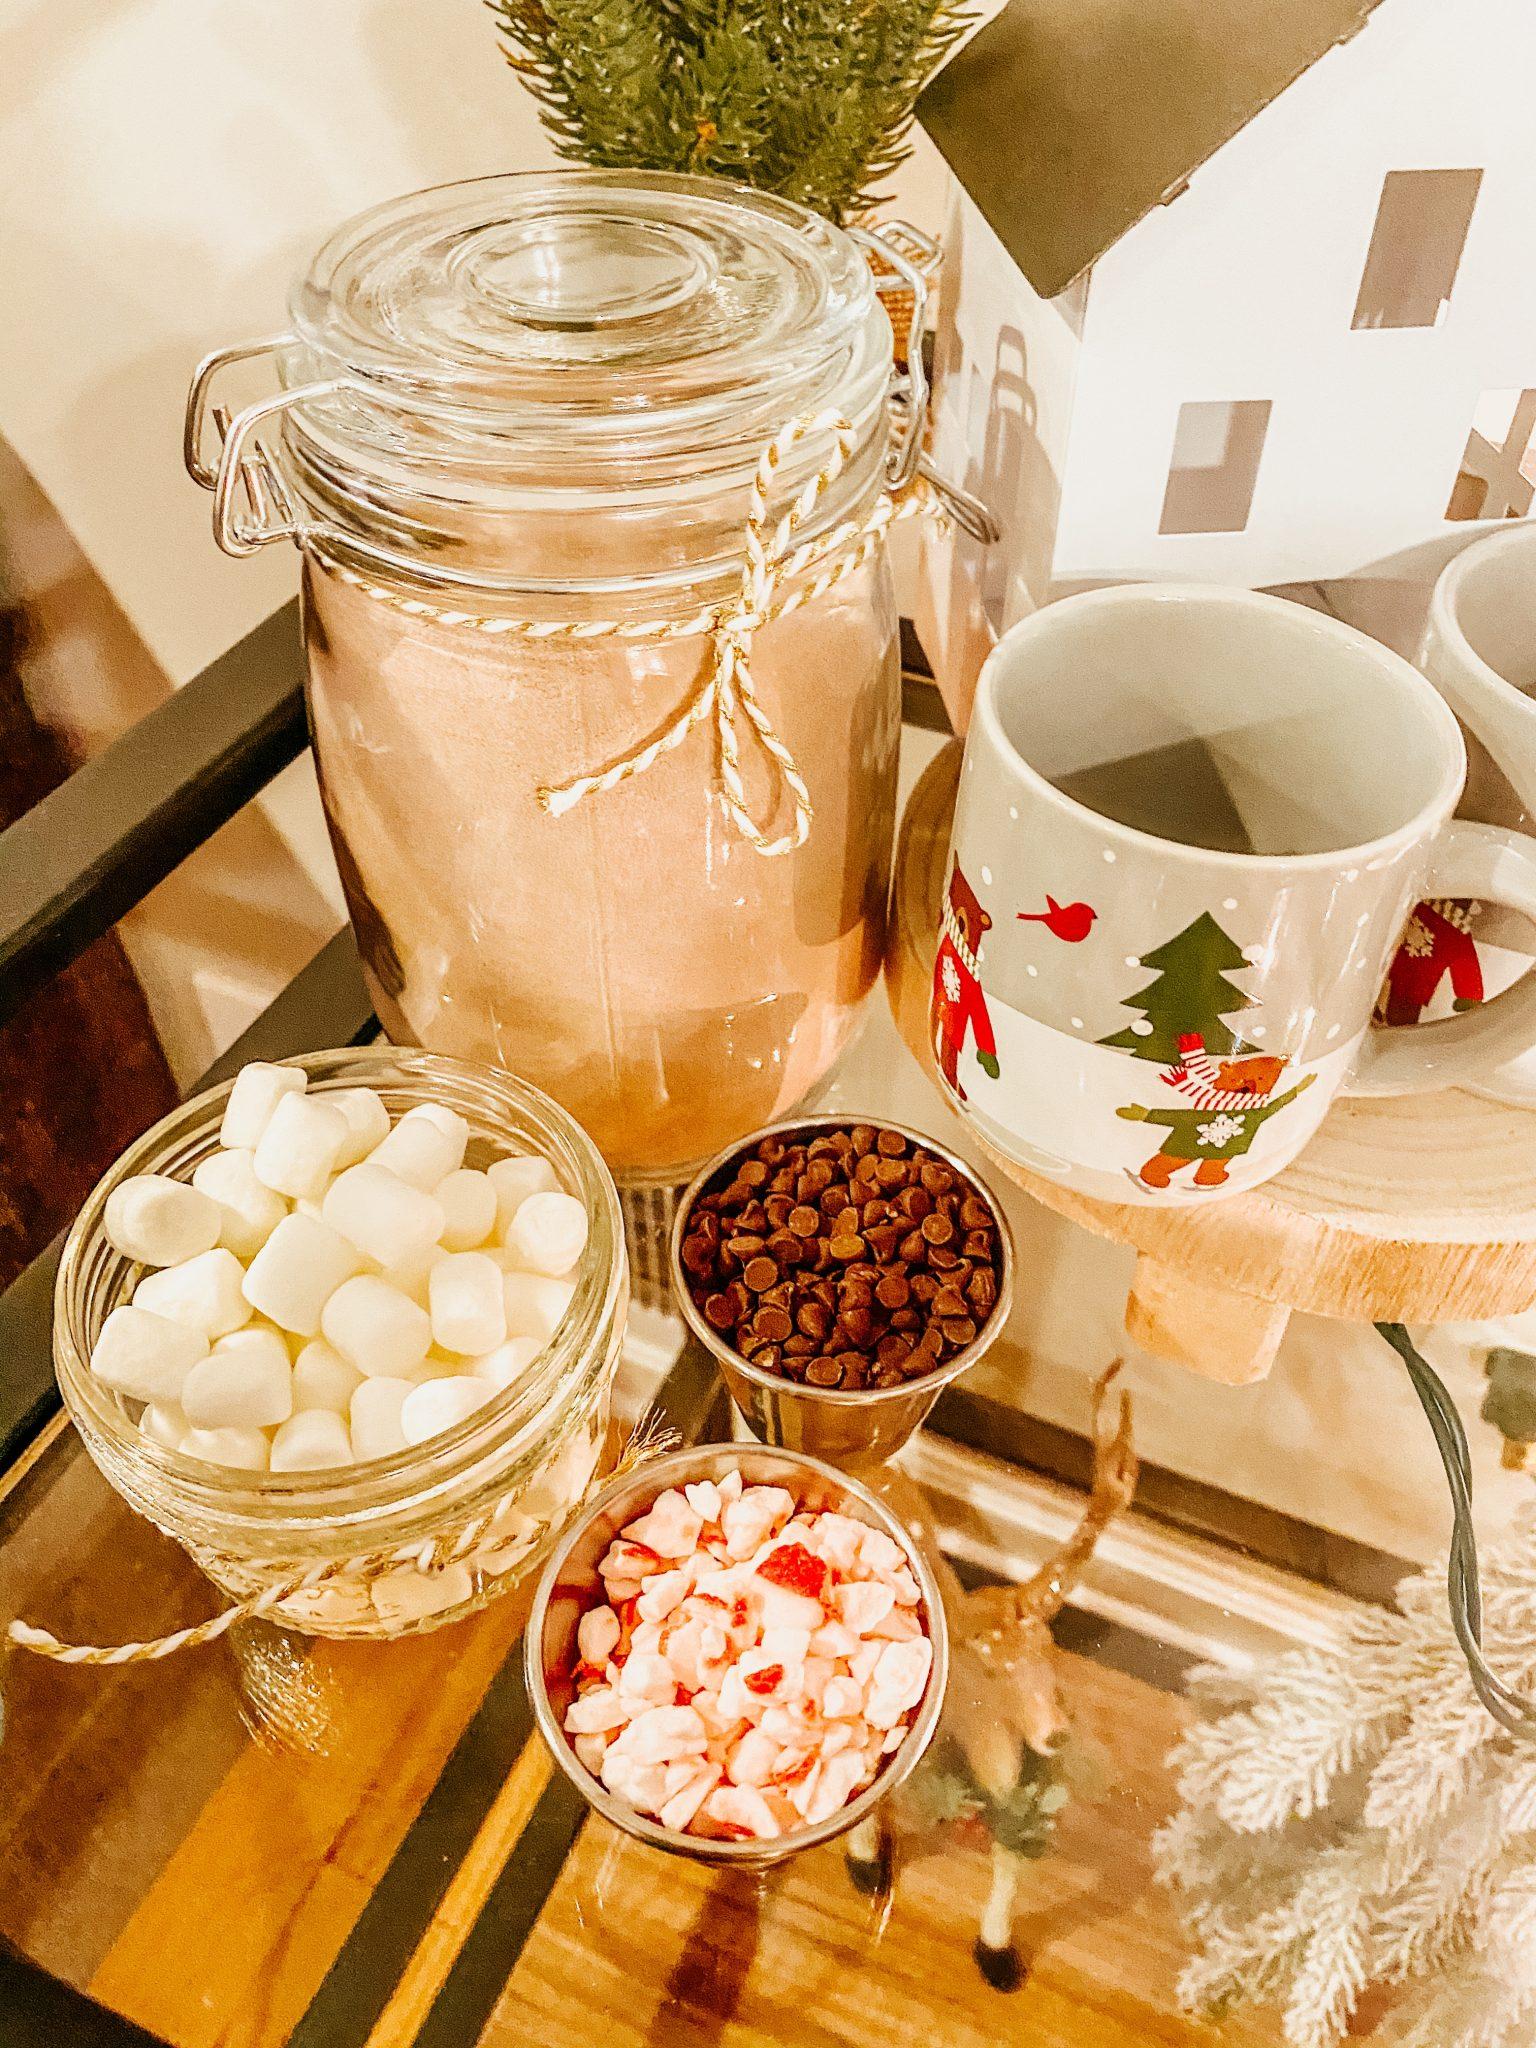 Hot Chocolate Bar Toppings | Daily Splendor Life and Style Blog #hotchocolate #wintertreat #holidaytreat #holidayhotchocolate #kidshotcocoabar #christmasdecor #barcart #hotchocolateprintable